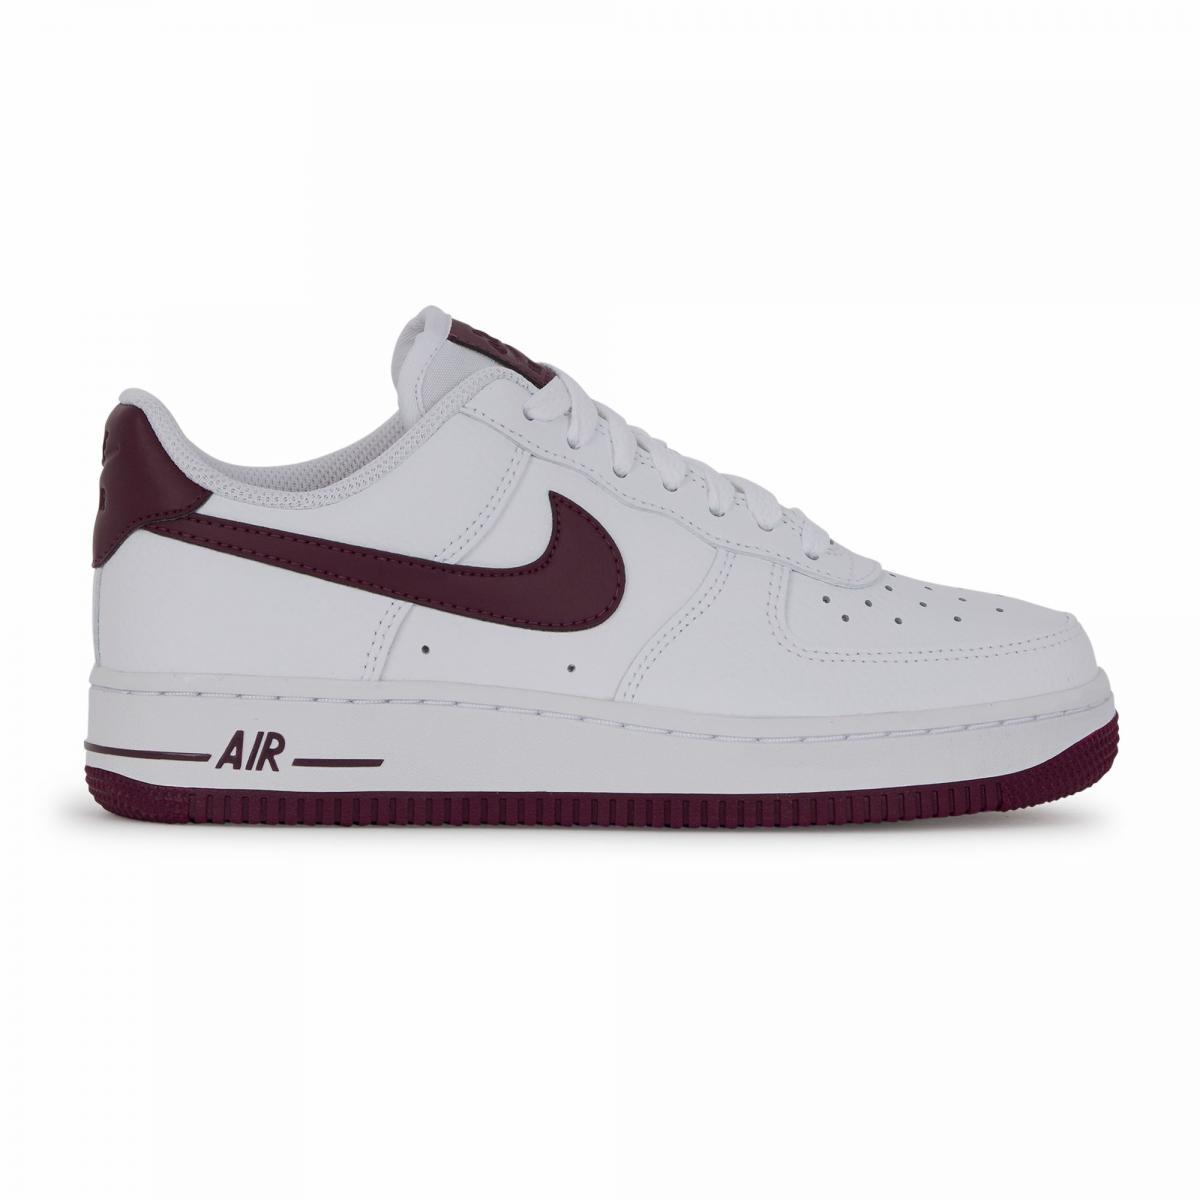 chaussure nike air force 1 noir et blanc femme